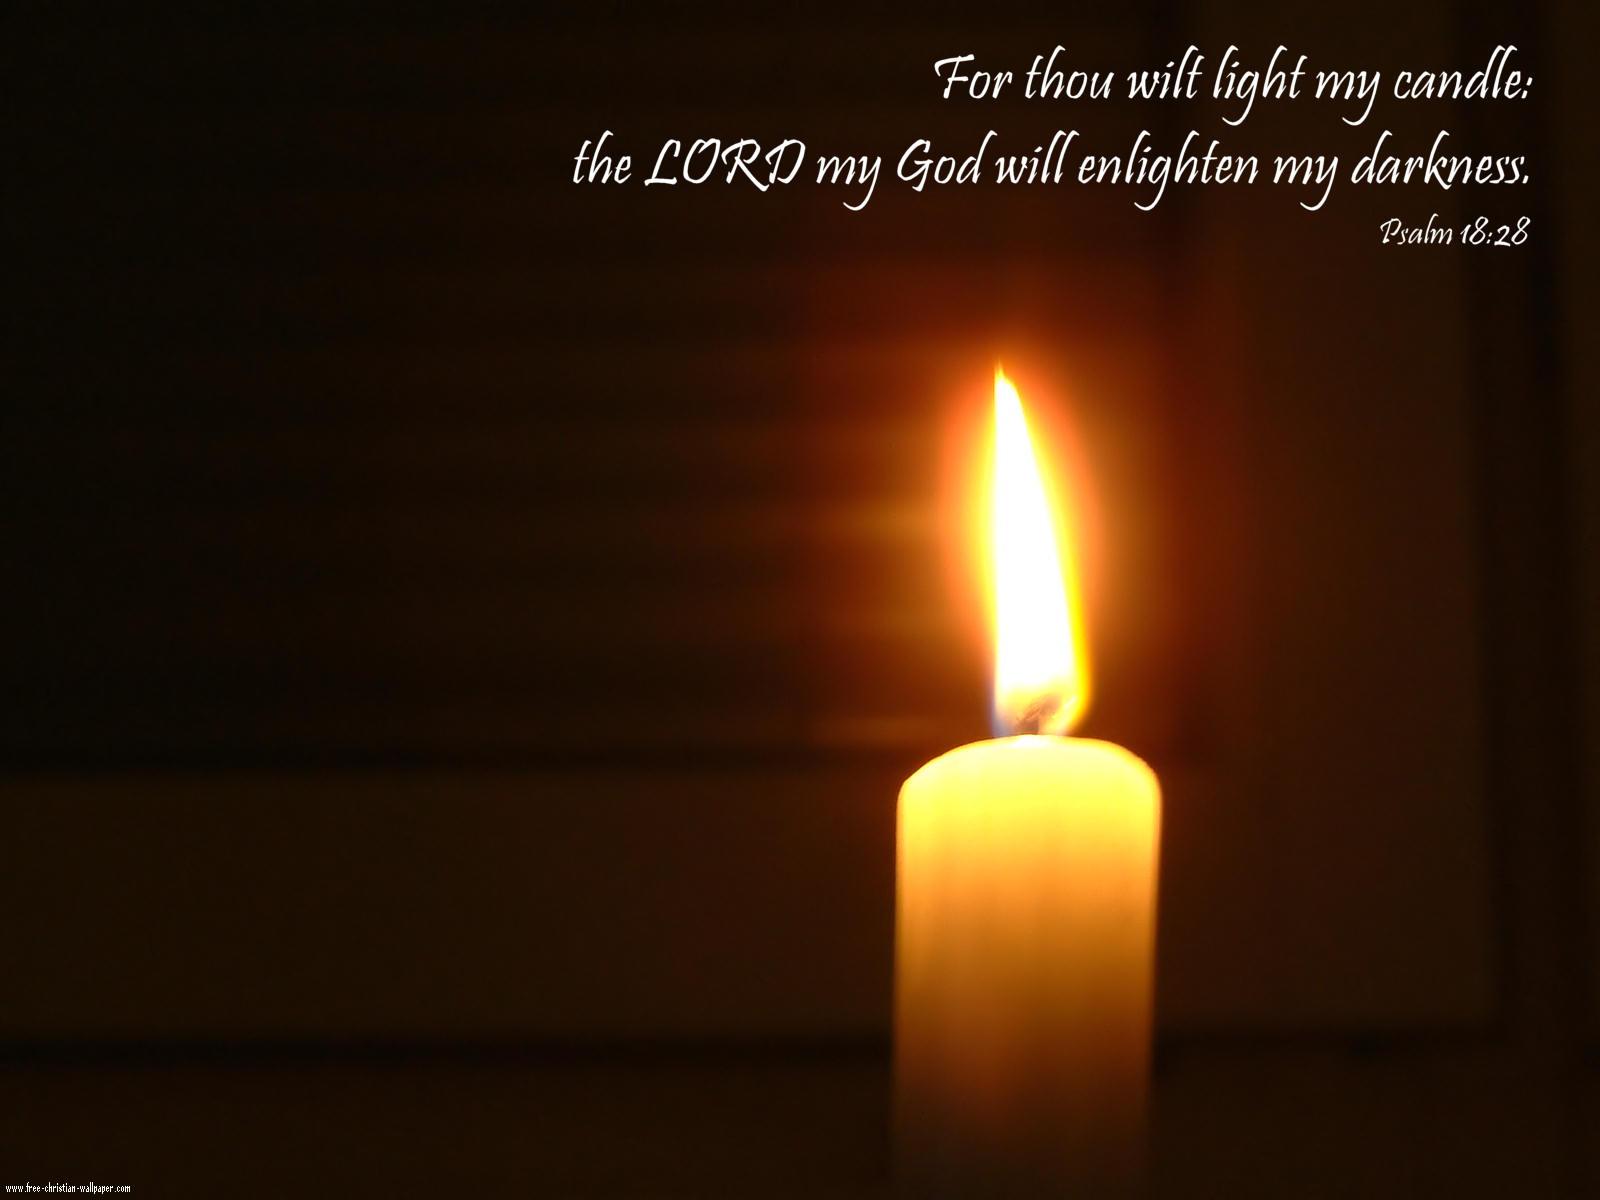 Beautiful   Wallpaper Horse Bible Verse - inspirational+bible+verse+ps18-28-1600x1200  Perfect Image Reference_17112.jpg